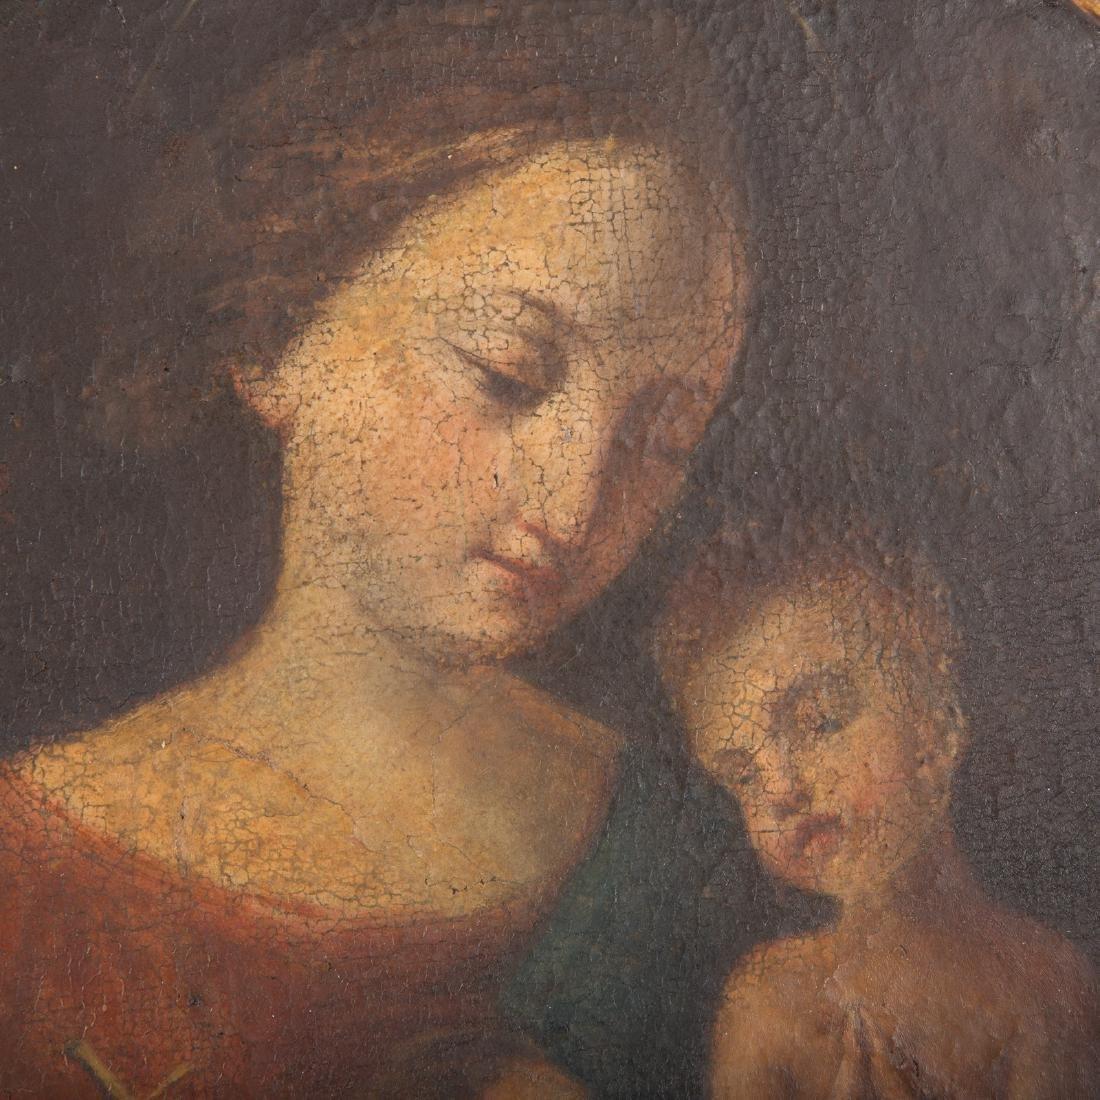 Italian School, 17th century. Madonna and Child - 2